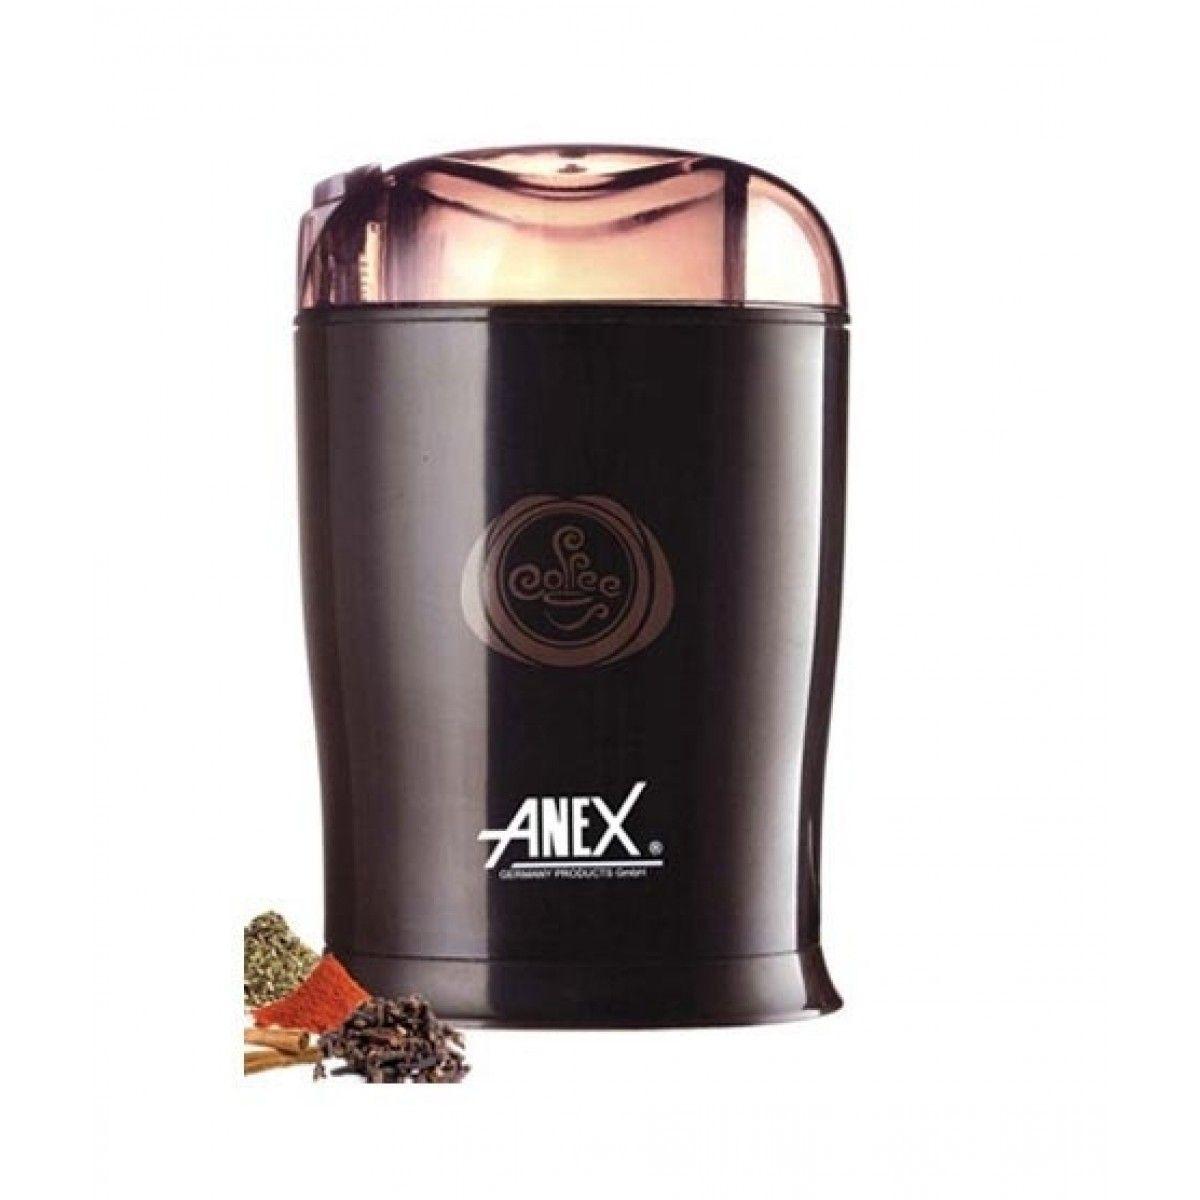 Anex AG-632 Coffee Grinder